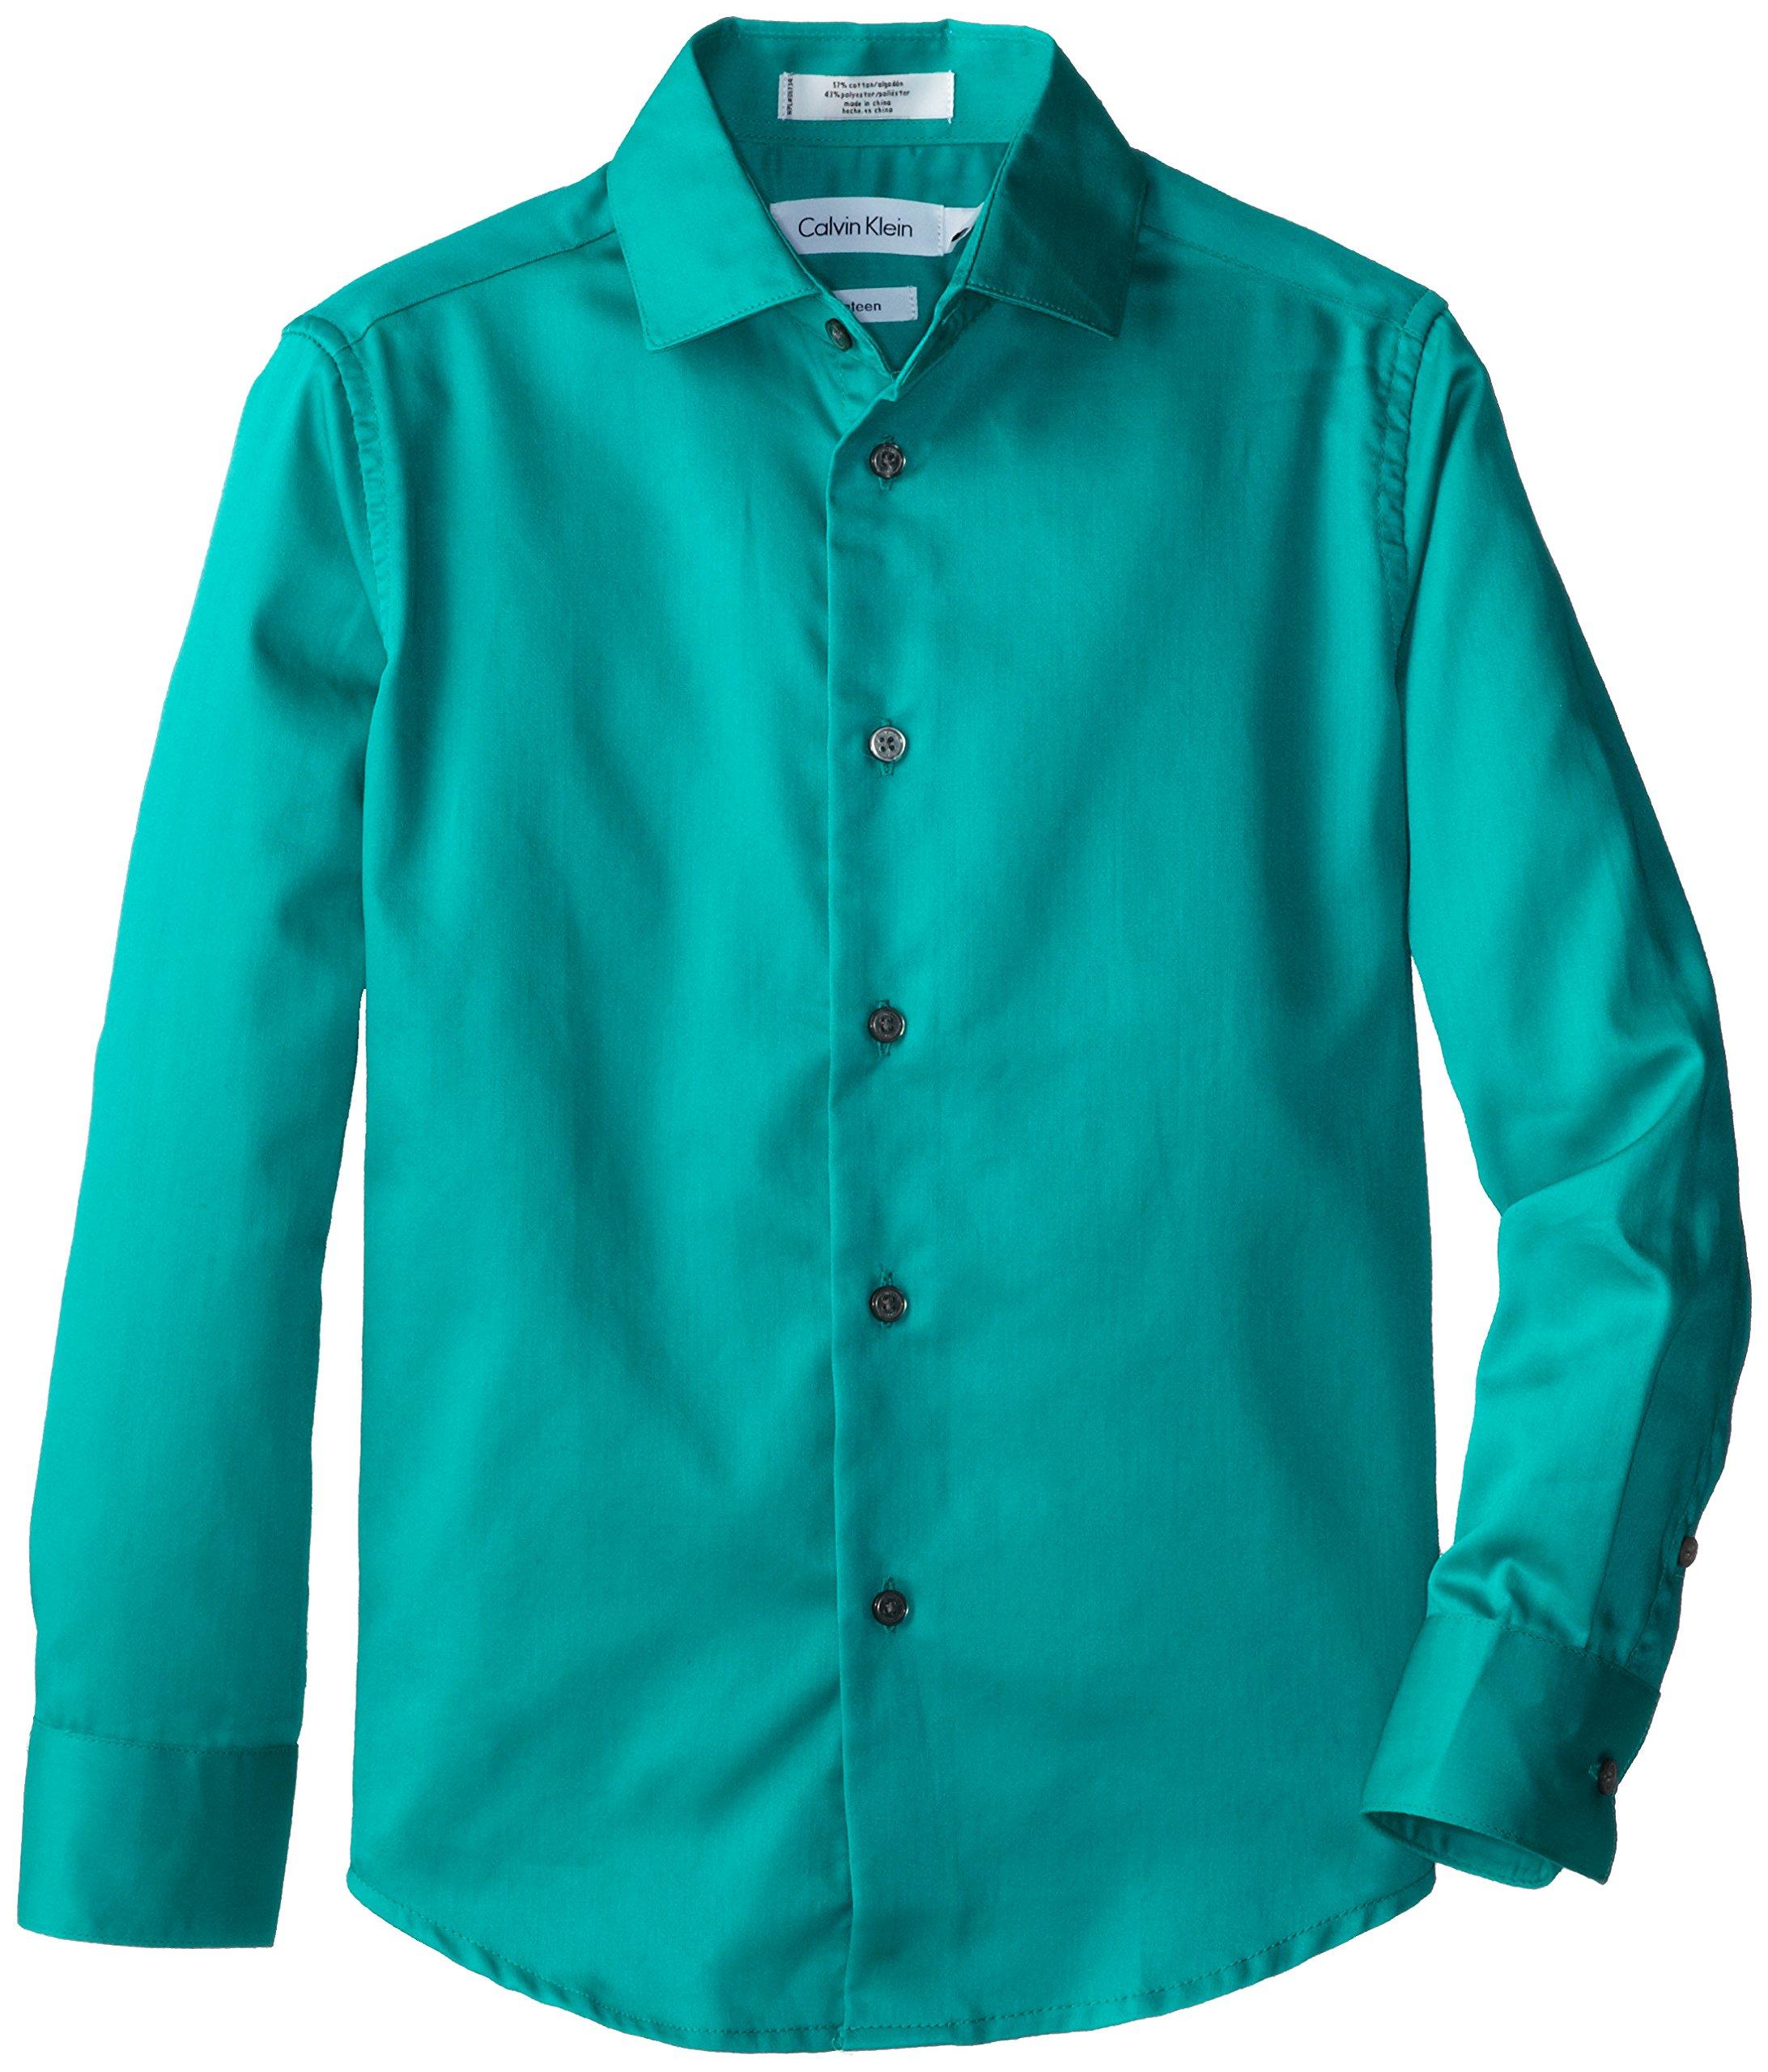 Calvin Klein Big Boys' Long Sleeve Sateen Dress Shirt, Bright Aqua, 20